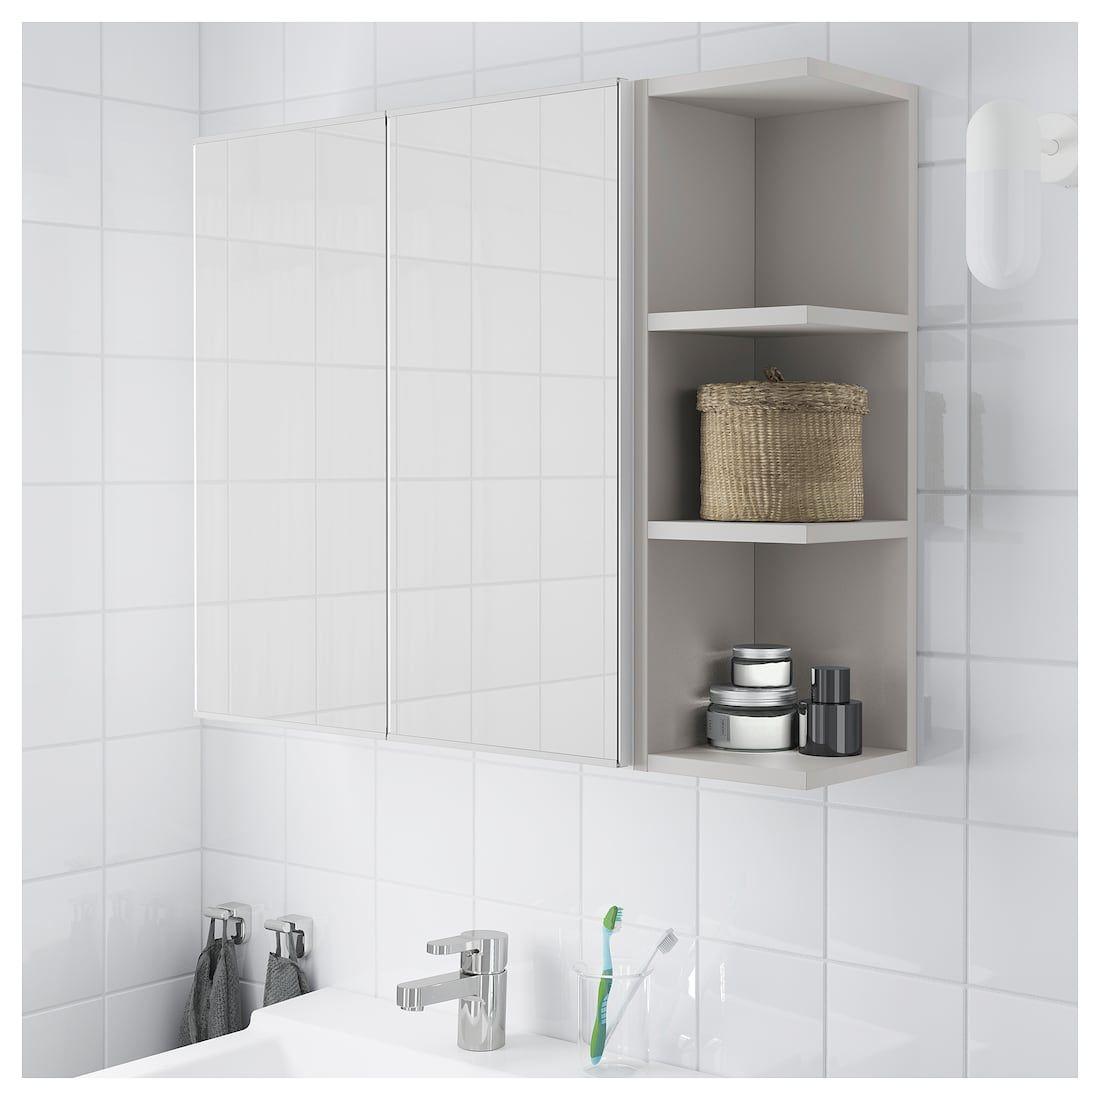 Lillangen Mirror Cabinet 2 Doors 1 End Unit White Gray 31 1 8x8